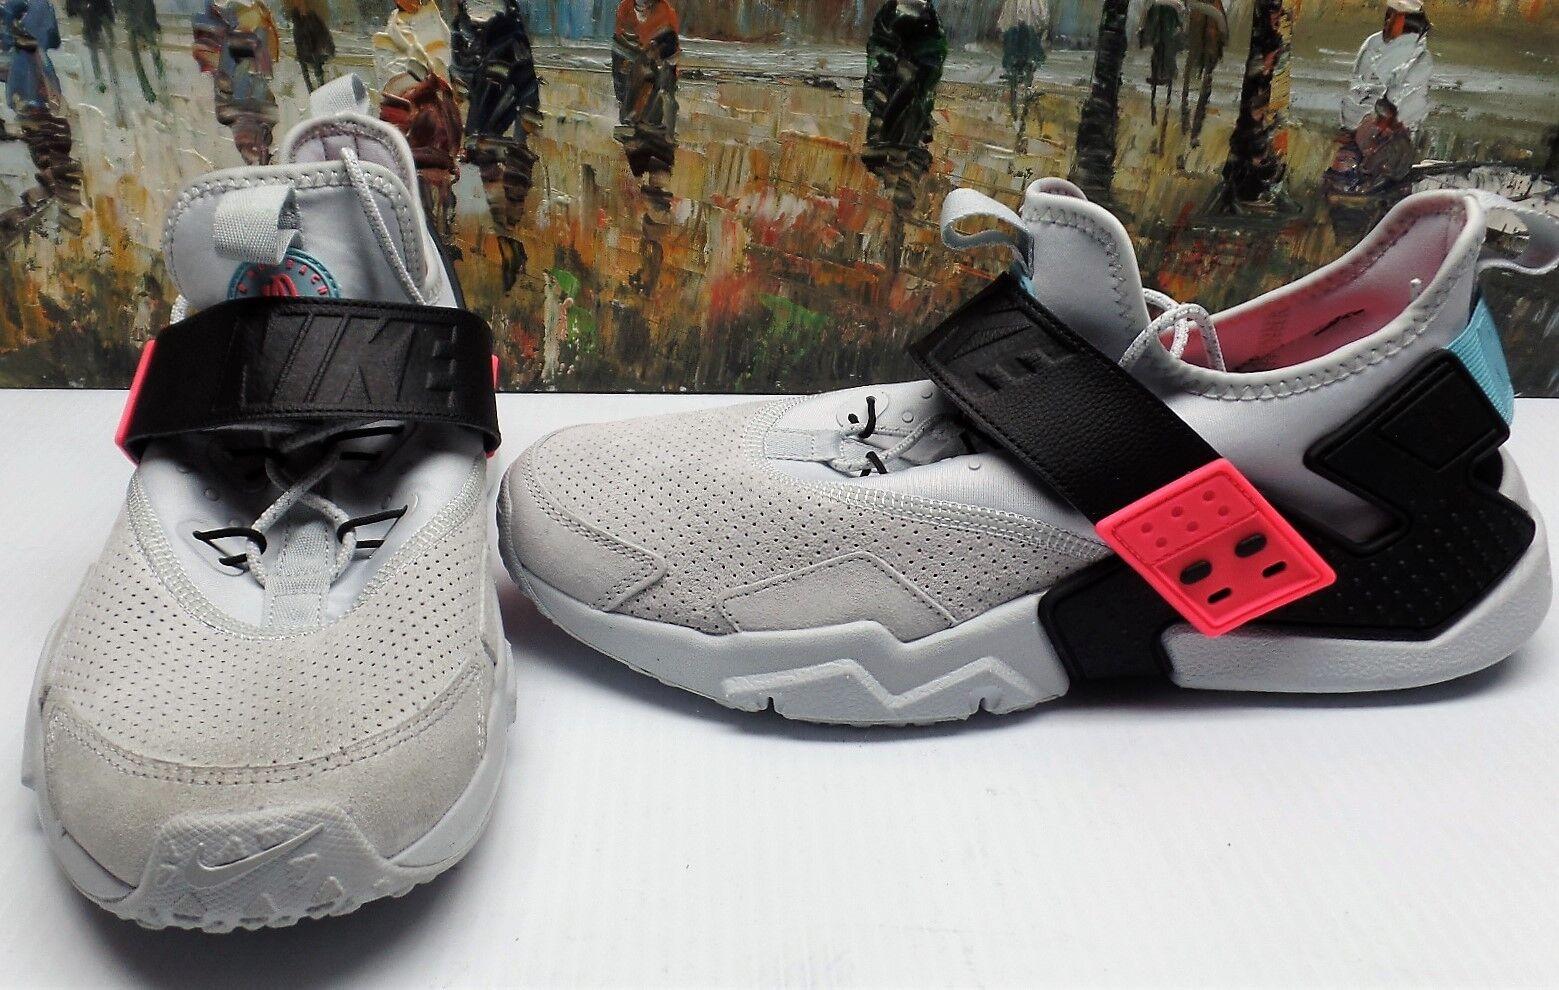 Nike Air Huarache Drift Premium Sneakers - Size 10 -  140